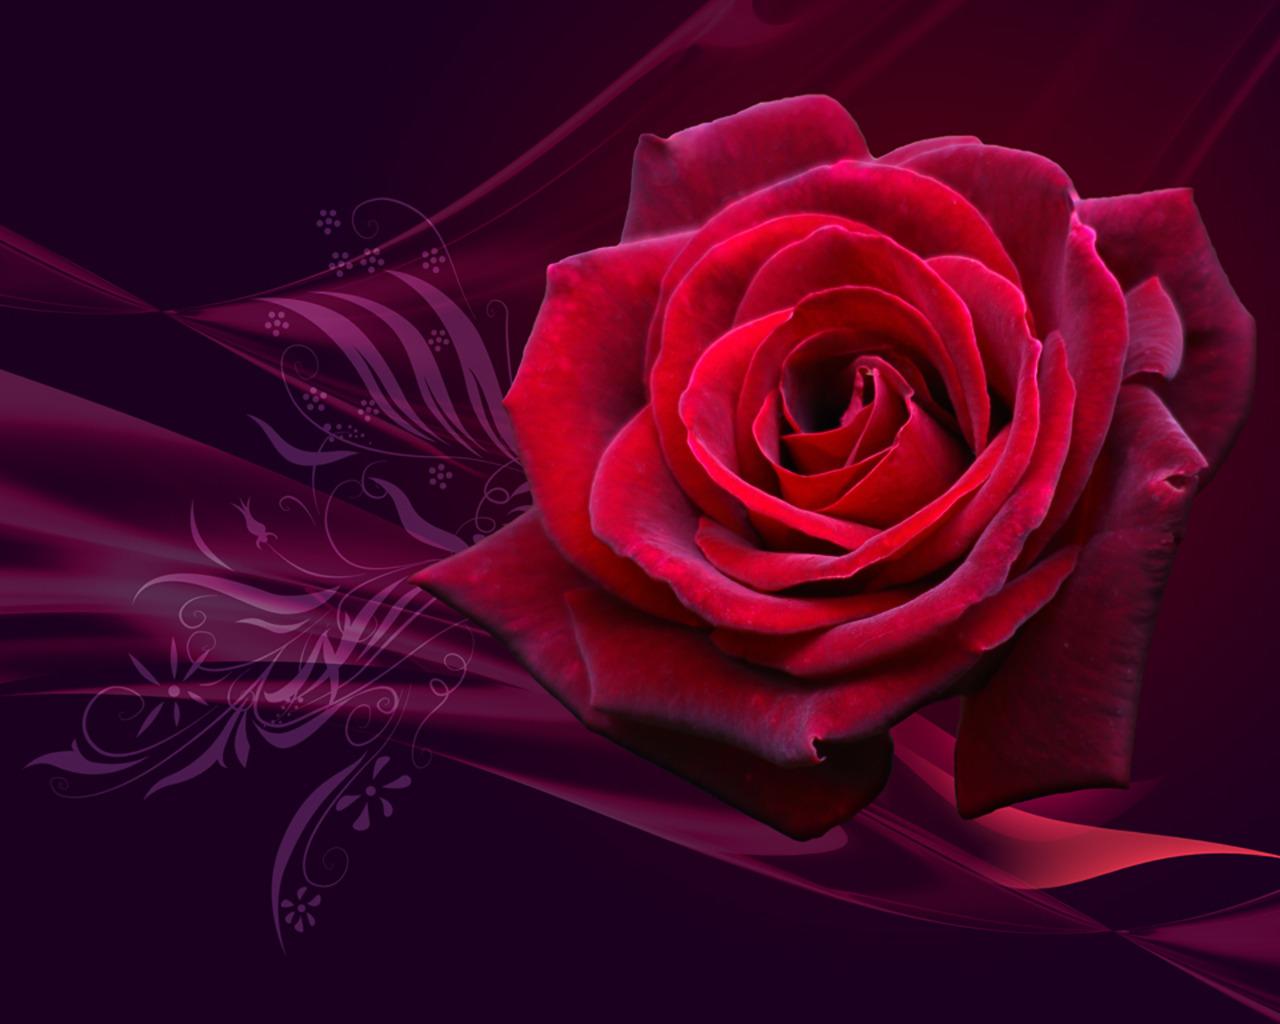 http://1.bp.blogspot.com/-3KsfrZ4fnig/TVdgIQslVUI/AAAAAAAADIk/QA1BhdLRvjk/s1600/Happy+valentine%2527s+day+2011+%25281%2529.jpg